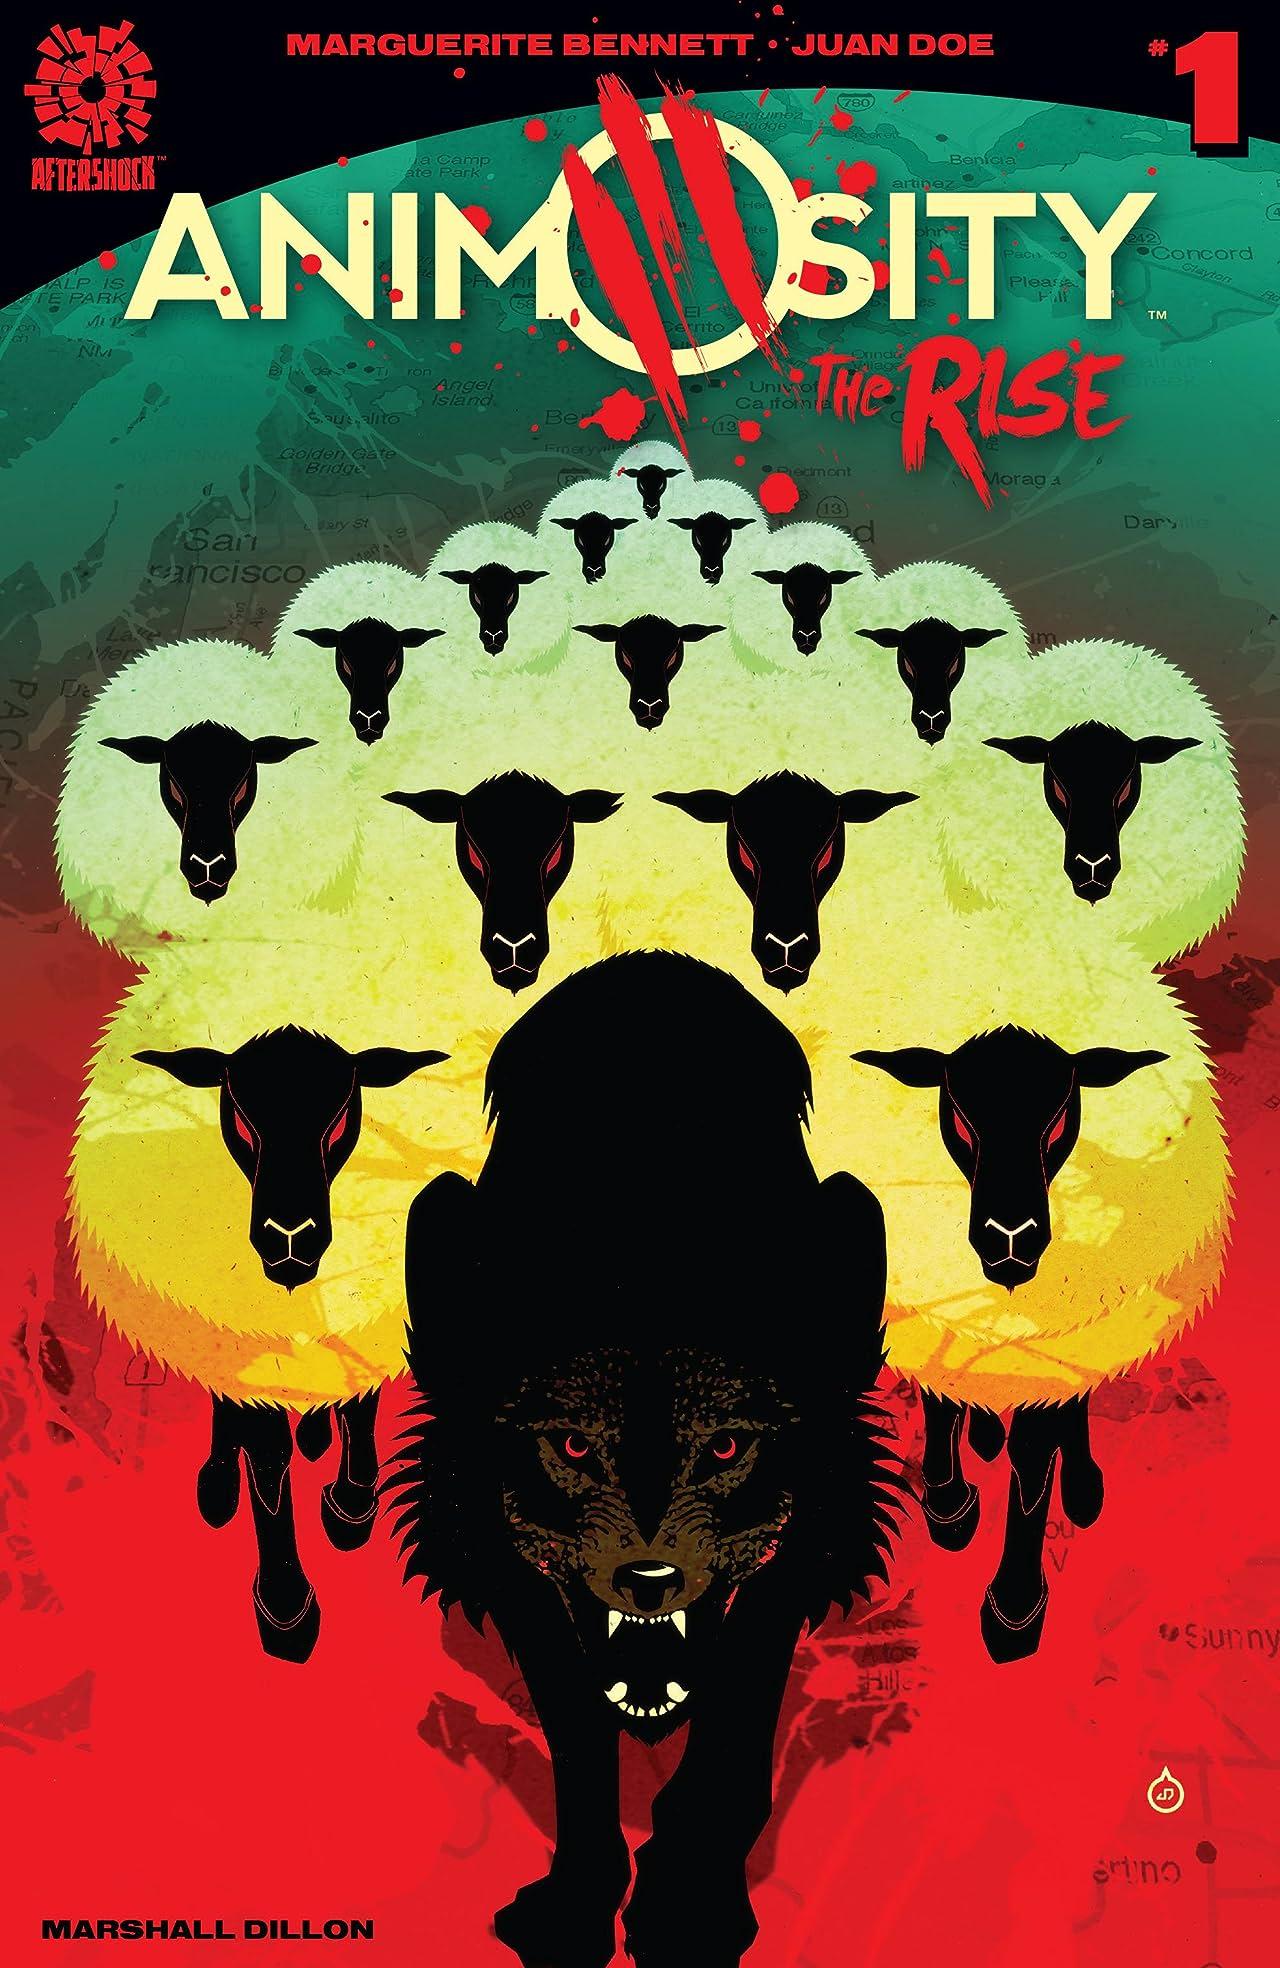 Animosity: The Rise #1